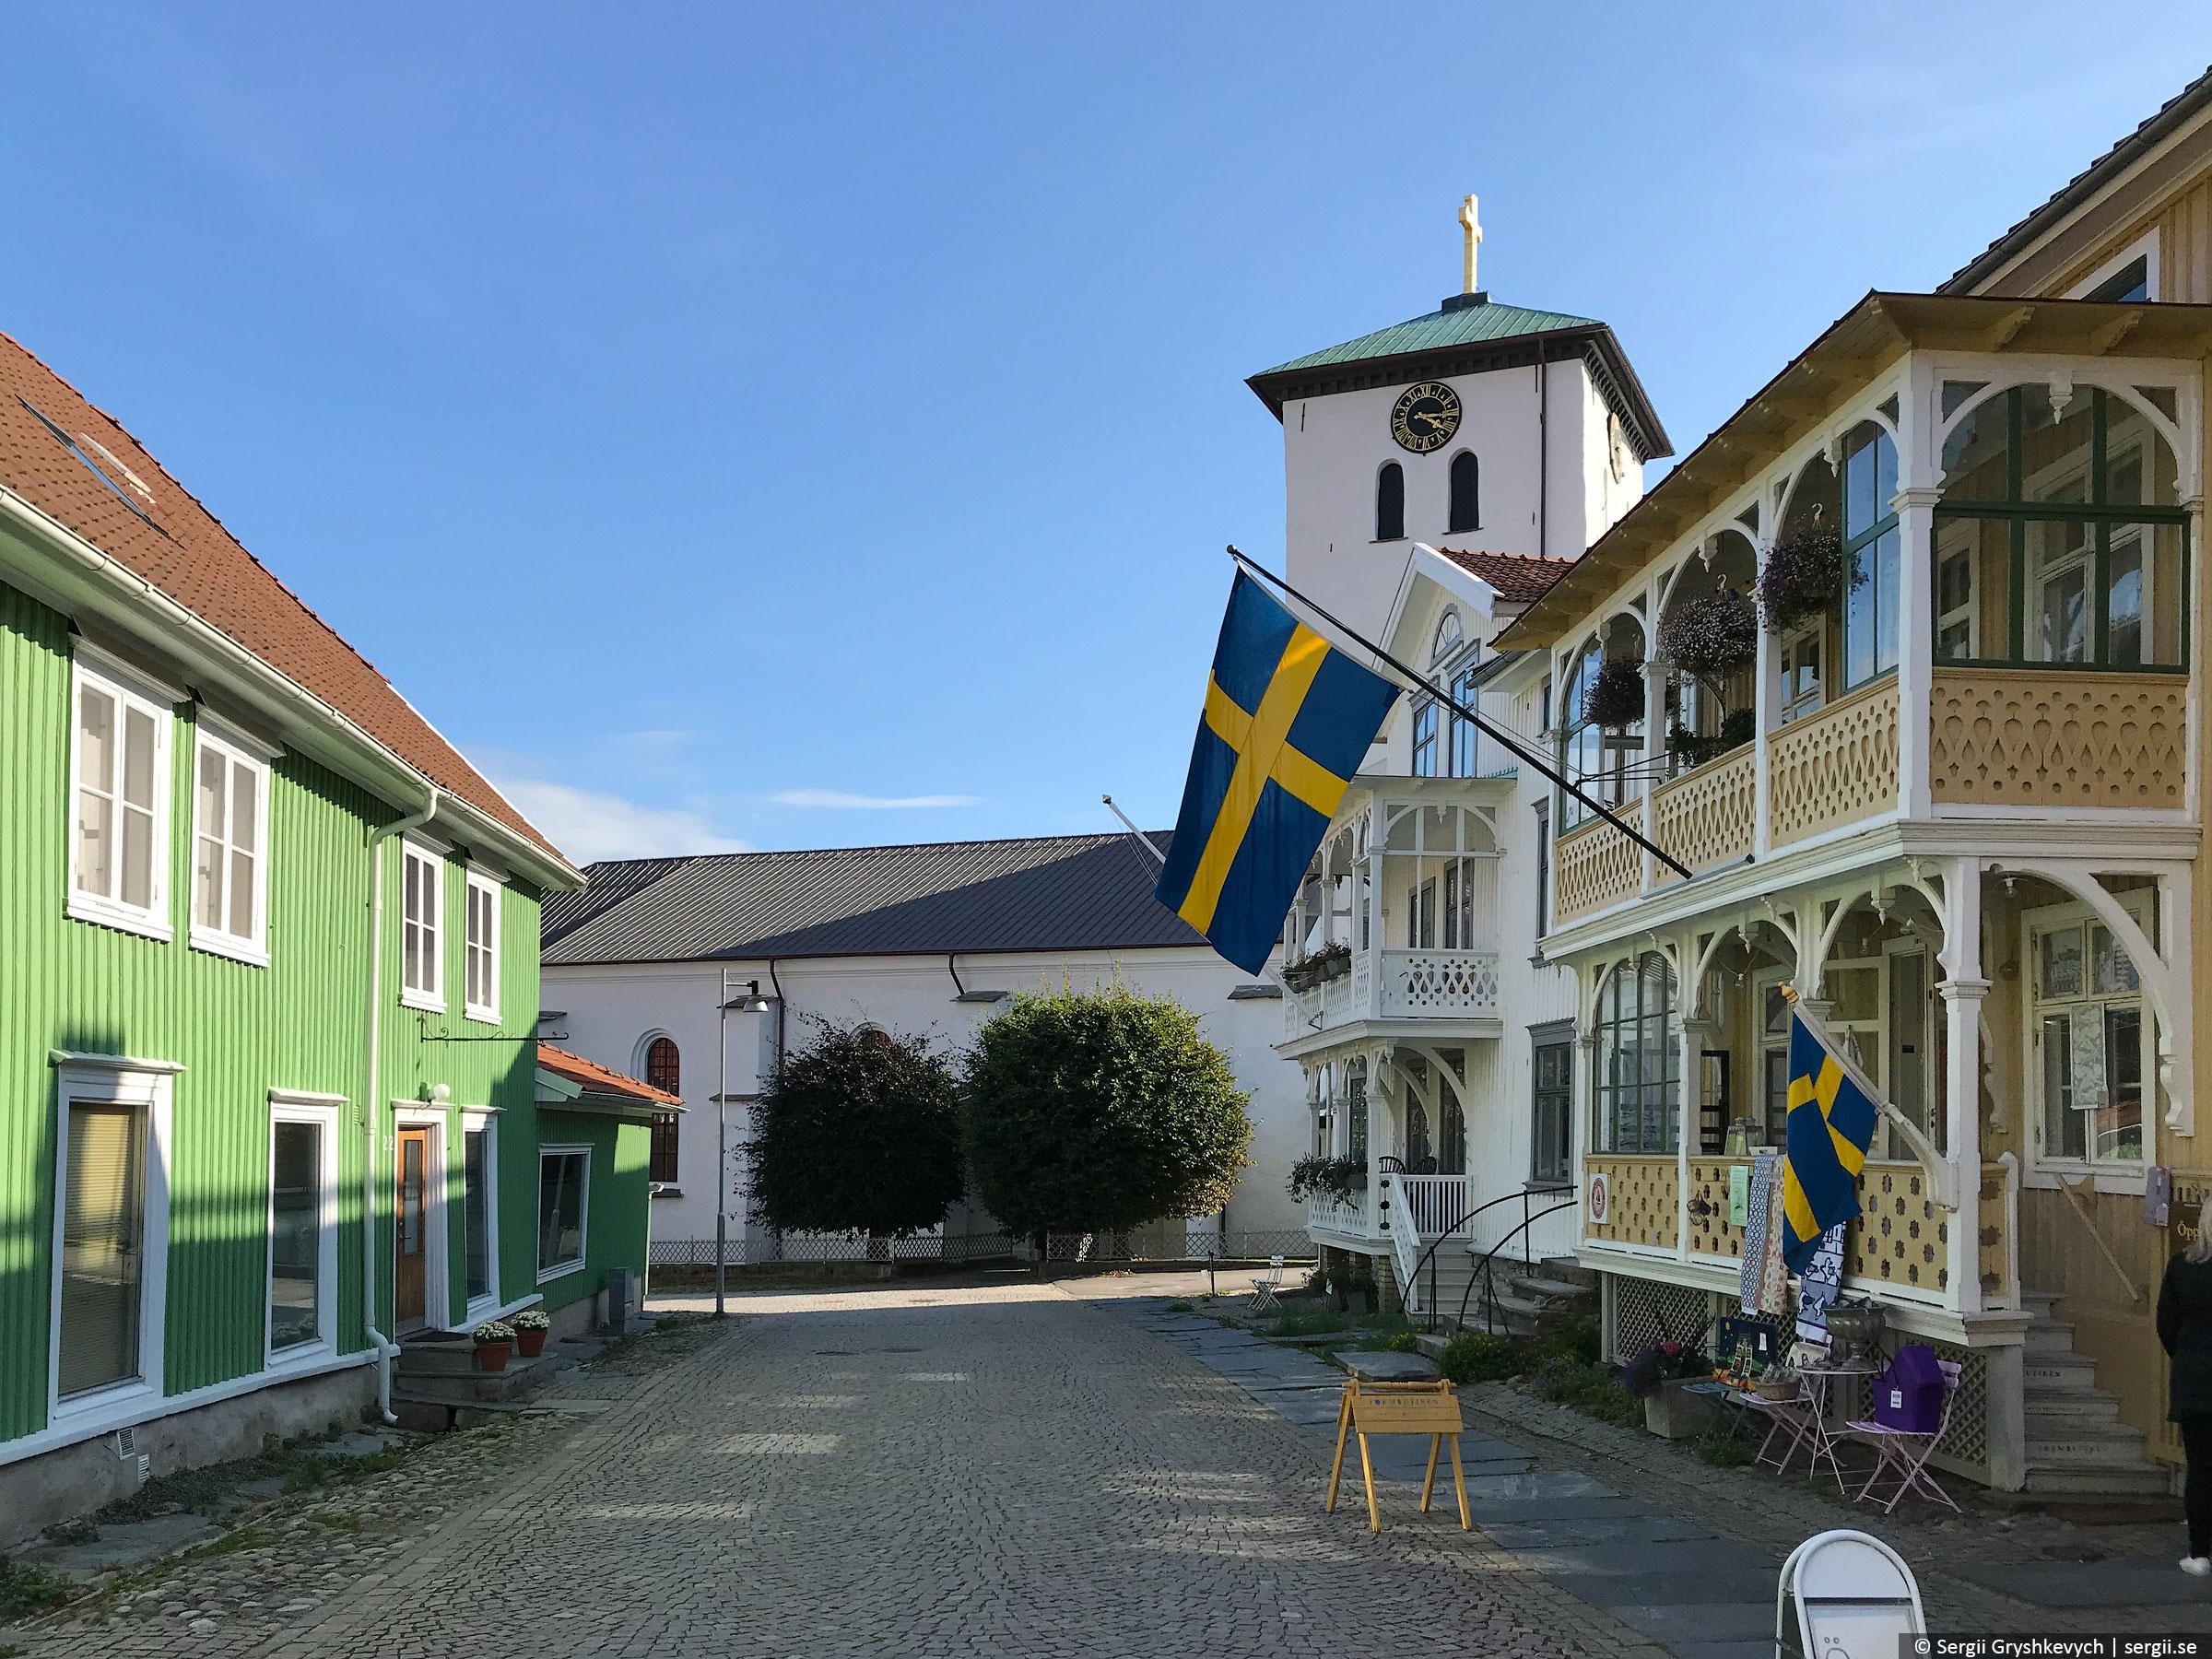 west-coast-sweden-2018-10